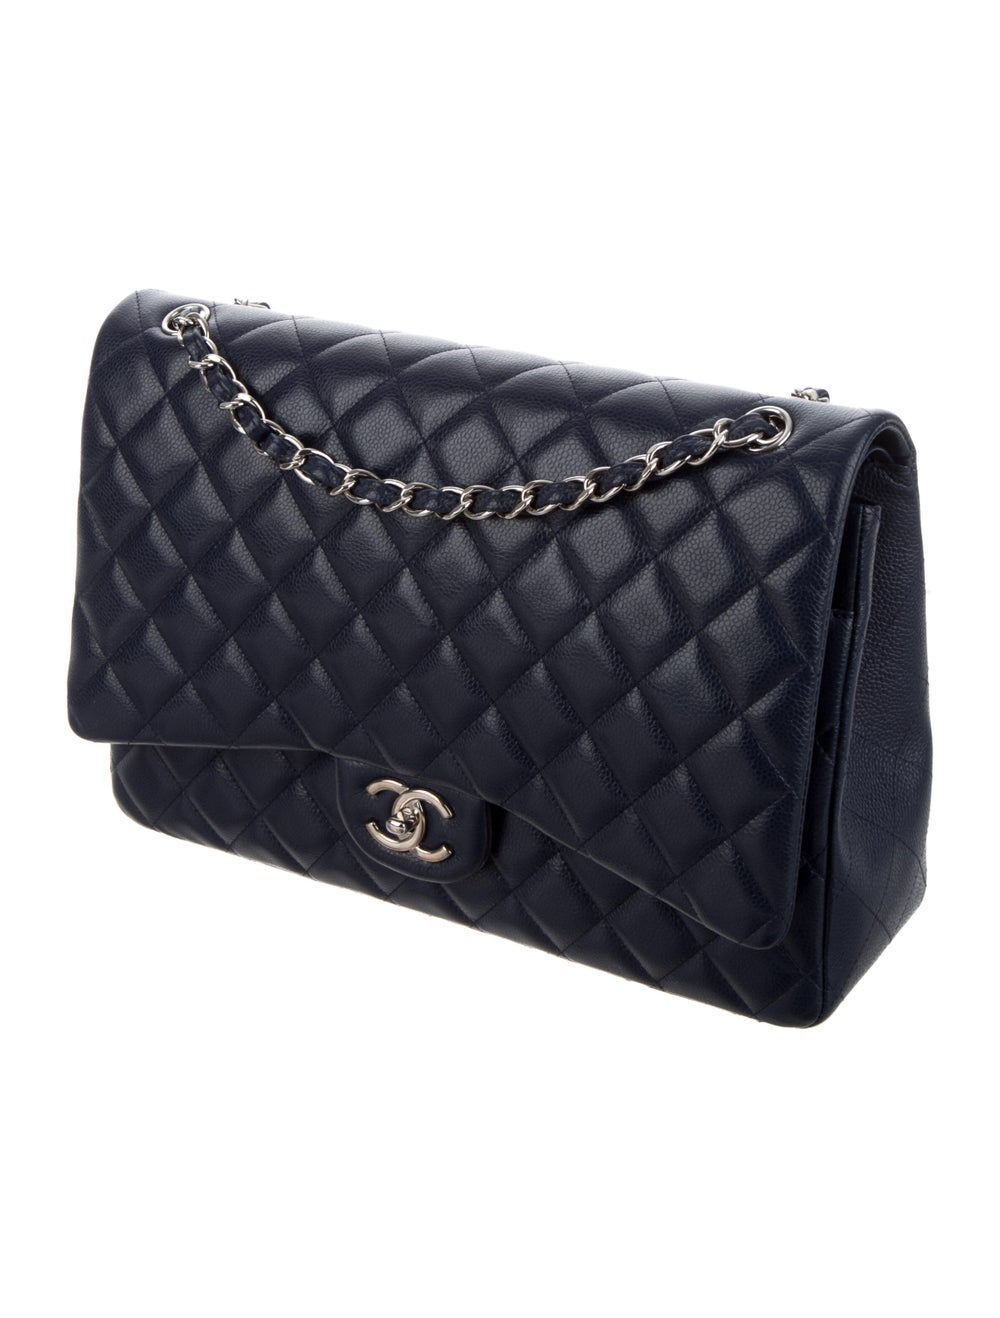 Chanel Classic Maxi Double Flap Bag Blue - image 3